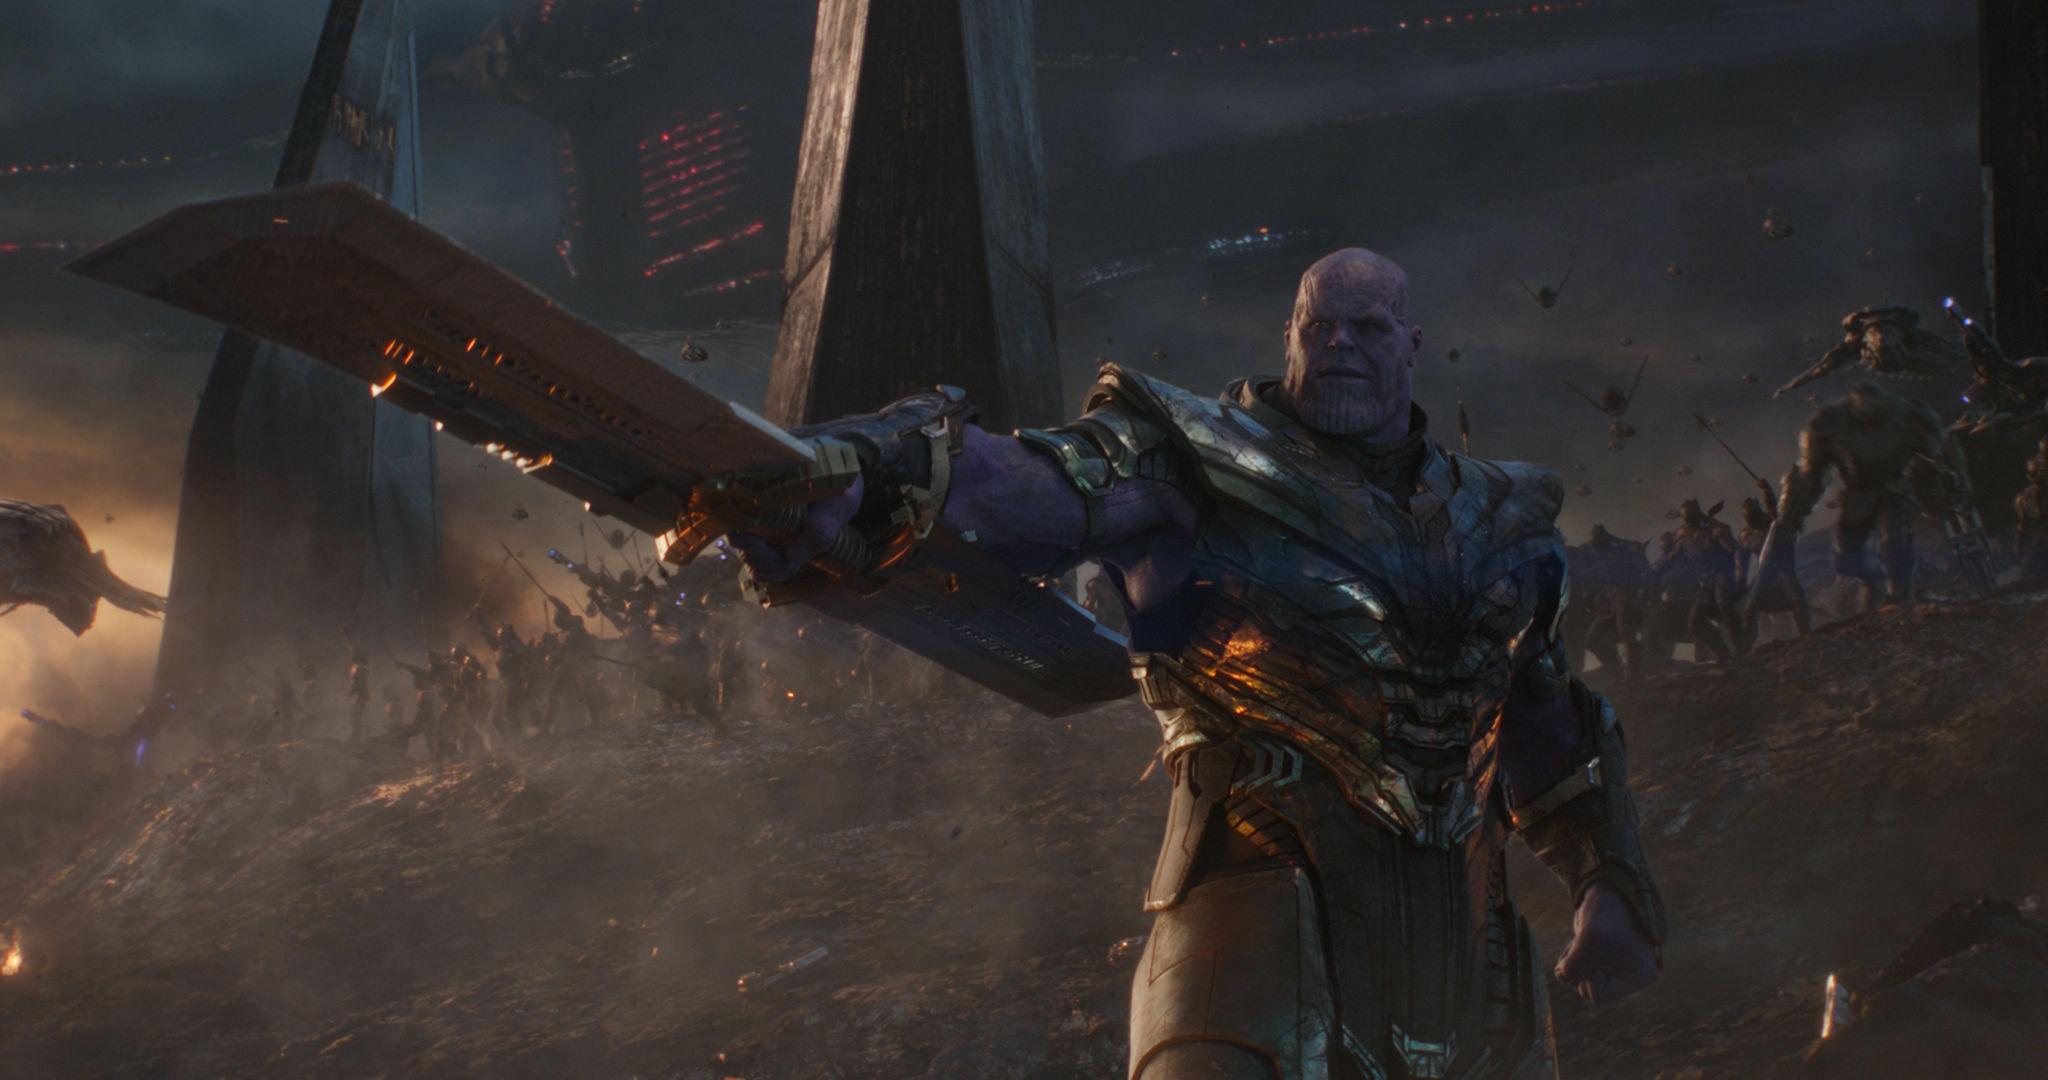 Comics: Avengers: Endgame; Oni Press & Lion Forge; Stan Lee